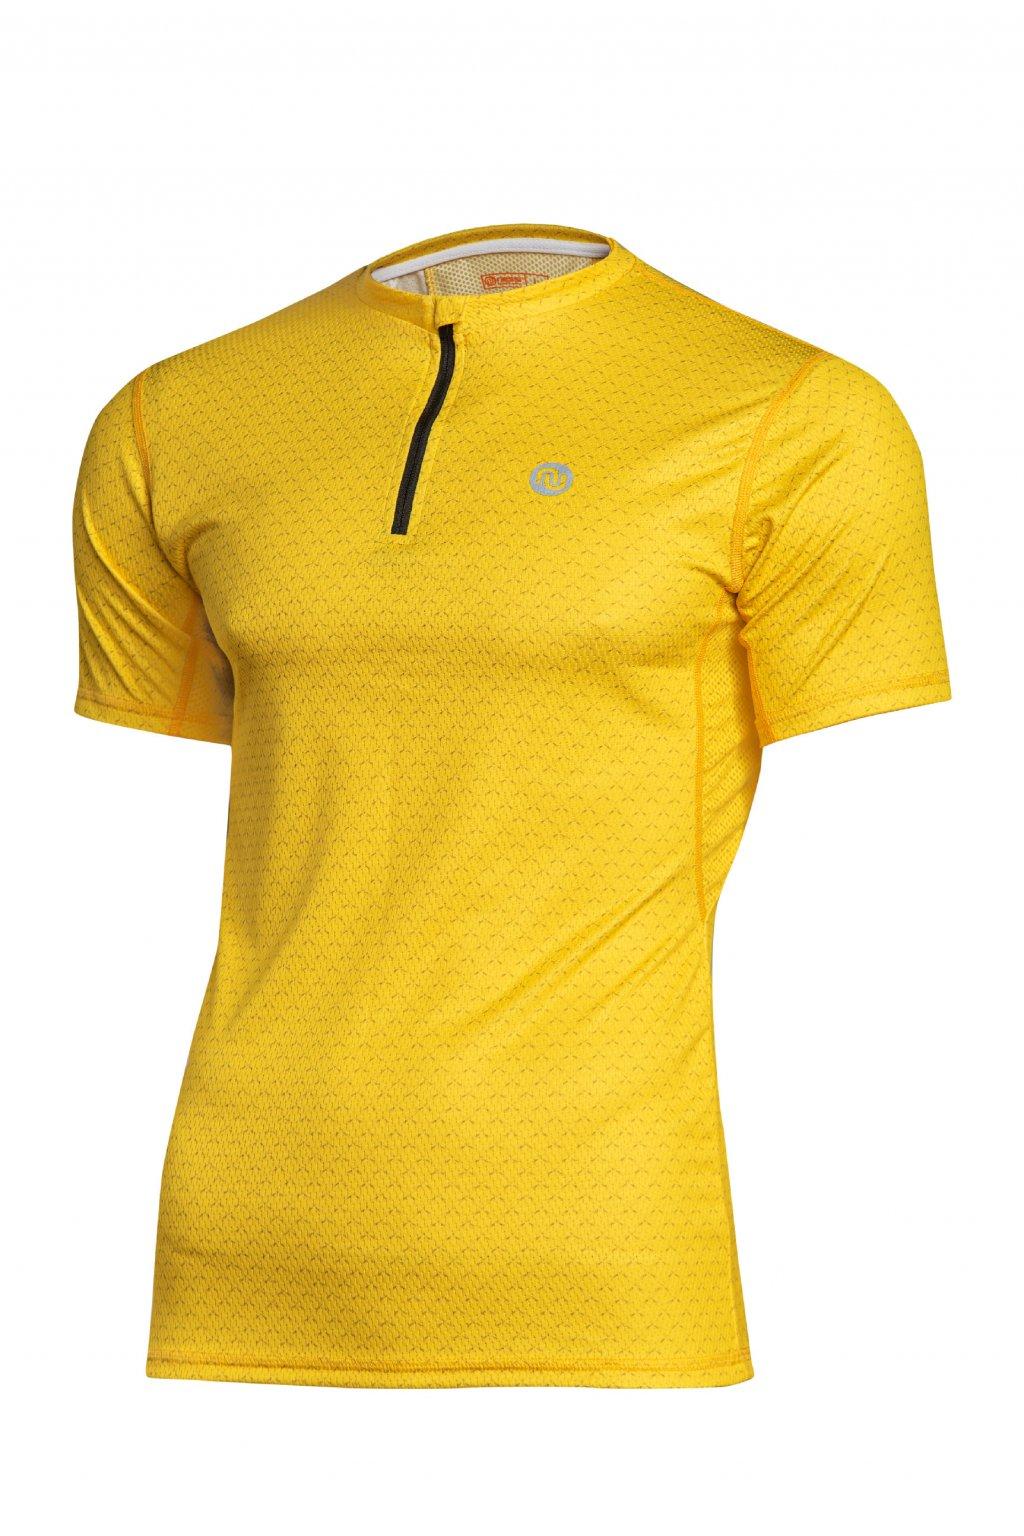 Pánské běžecké triko yellow mirage kmb 11x1 1